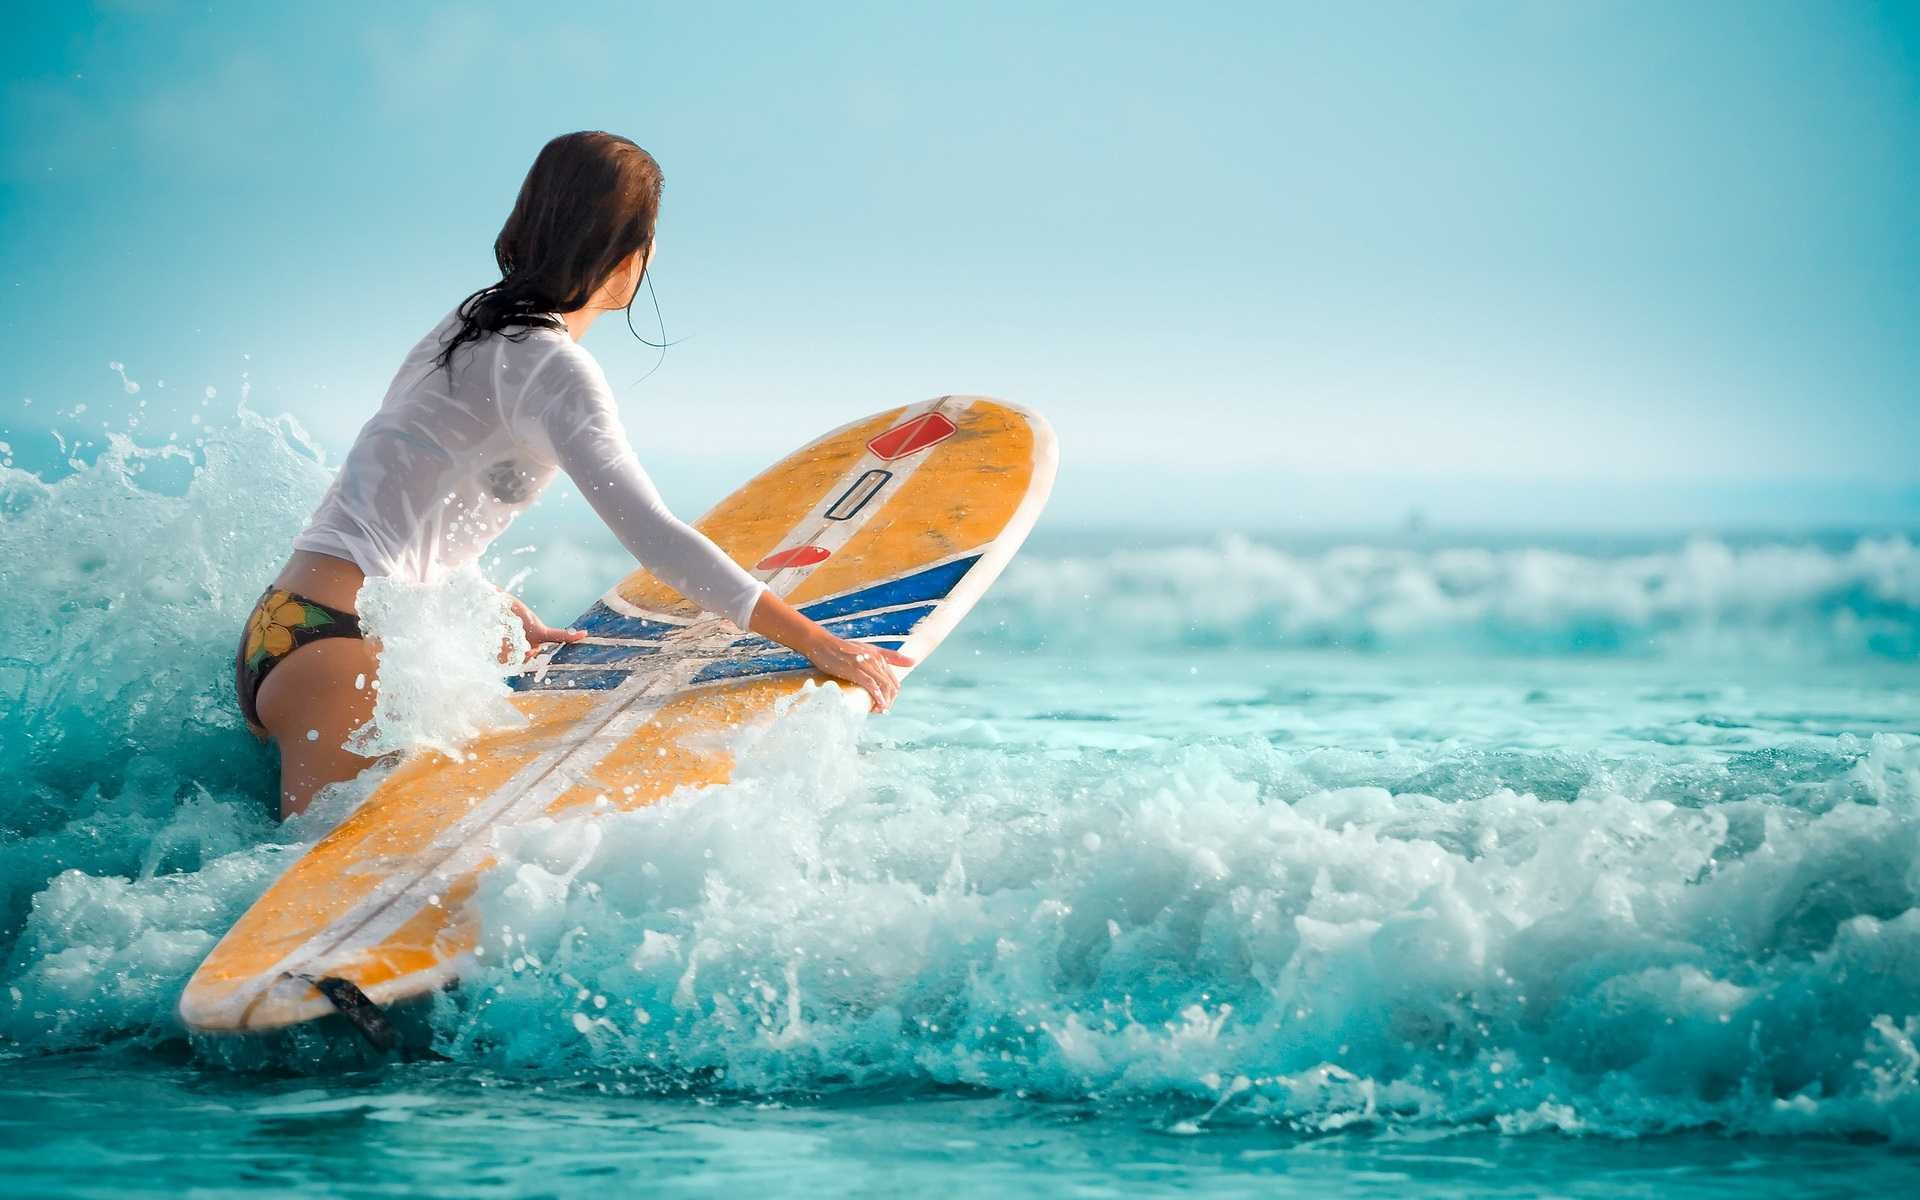 Surfer Girl HD Wallpaper   New HD Wallpapers 1920x1200